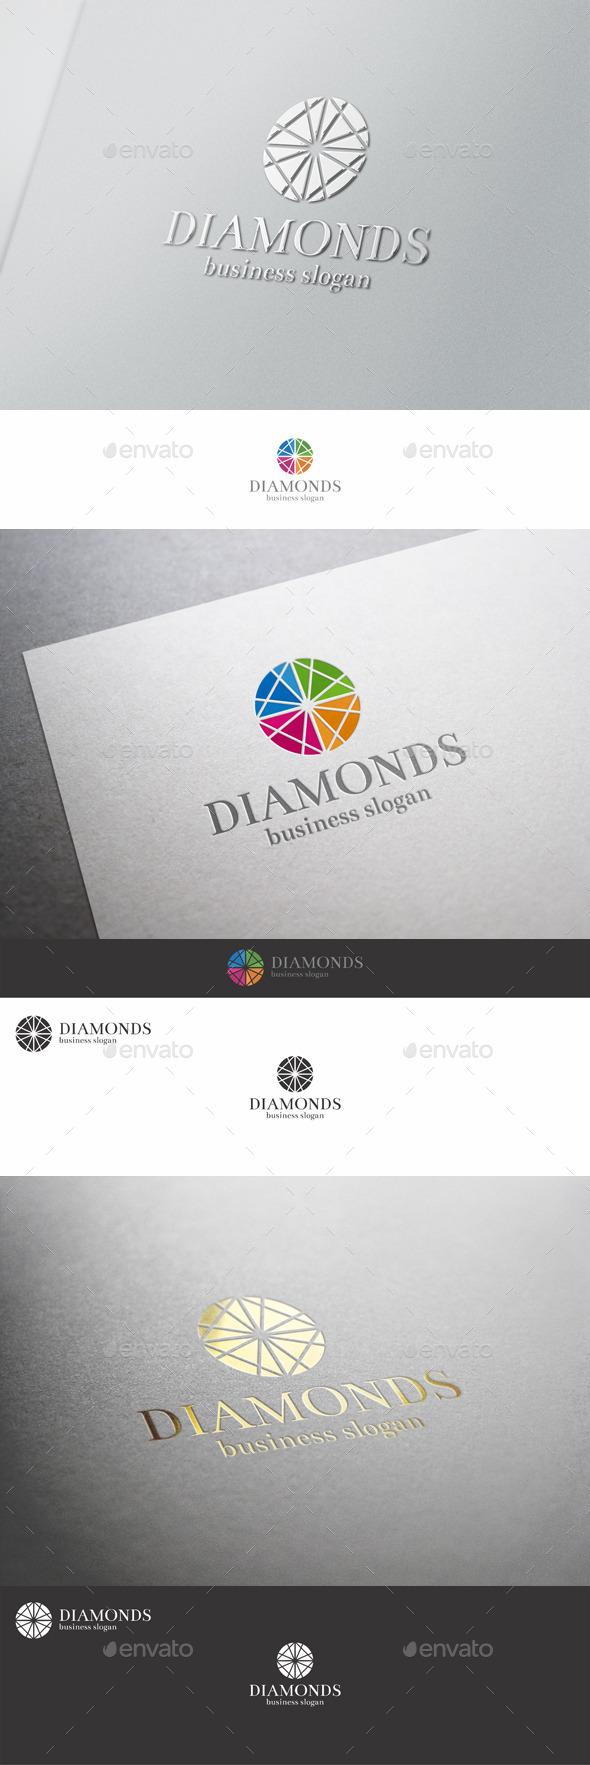 GraphicRiver Diamonds Logo Template 9855773